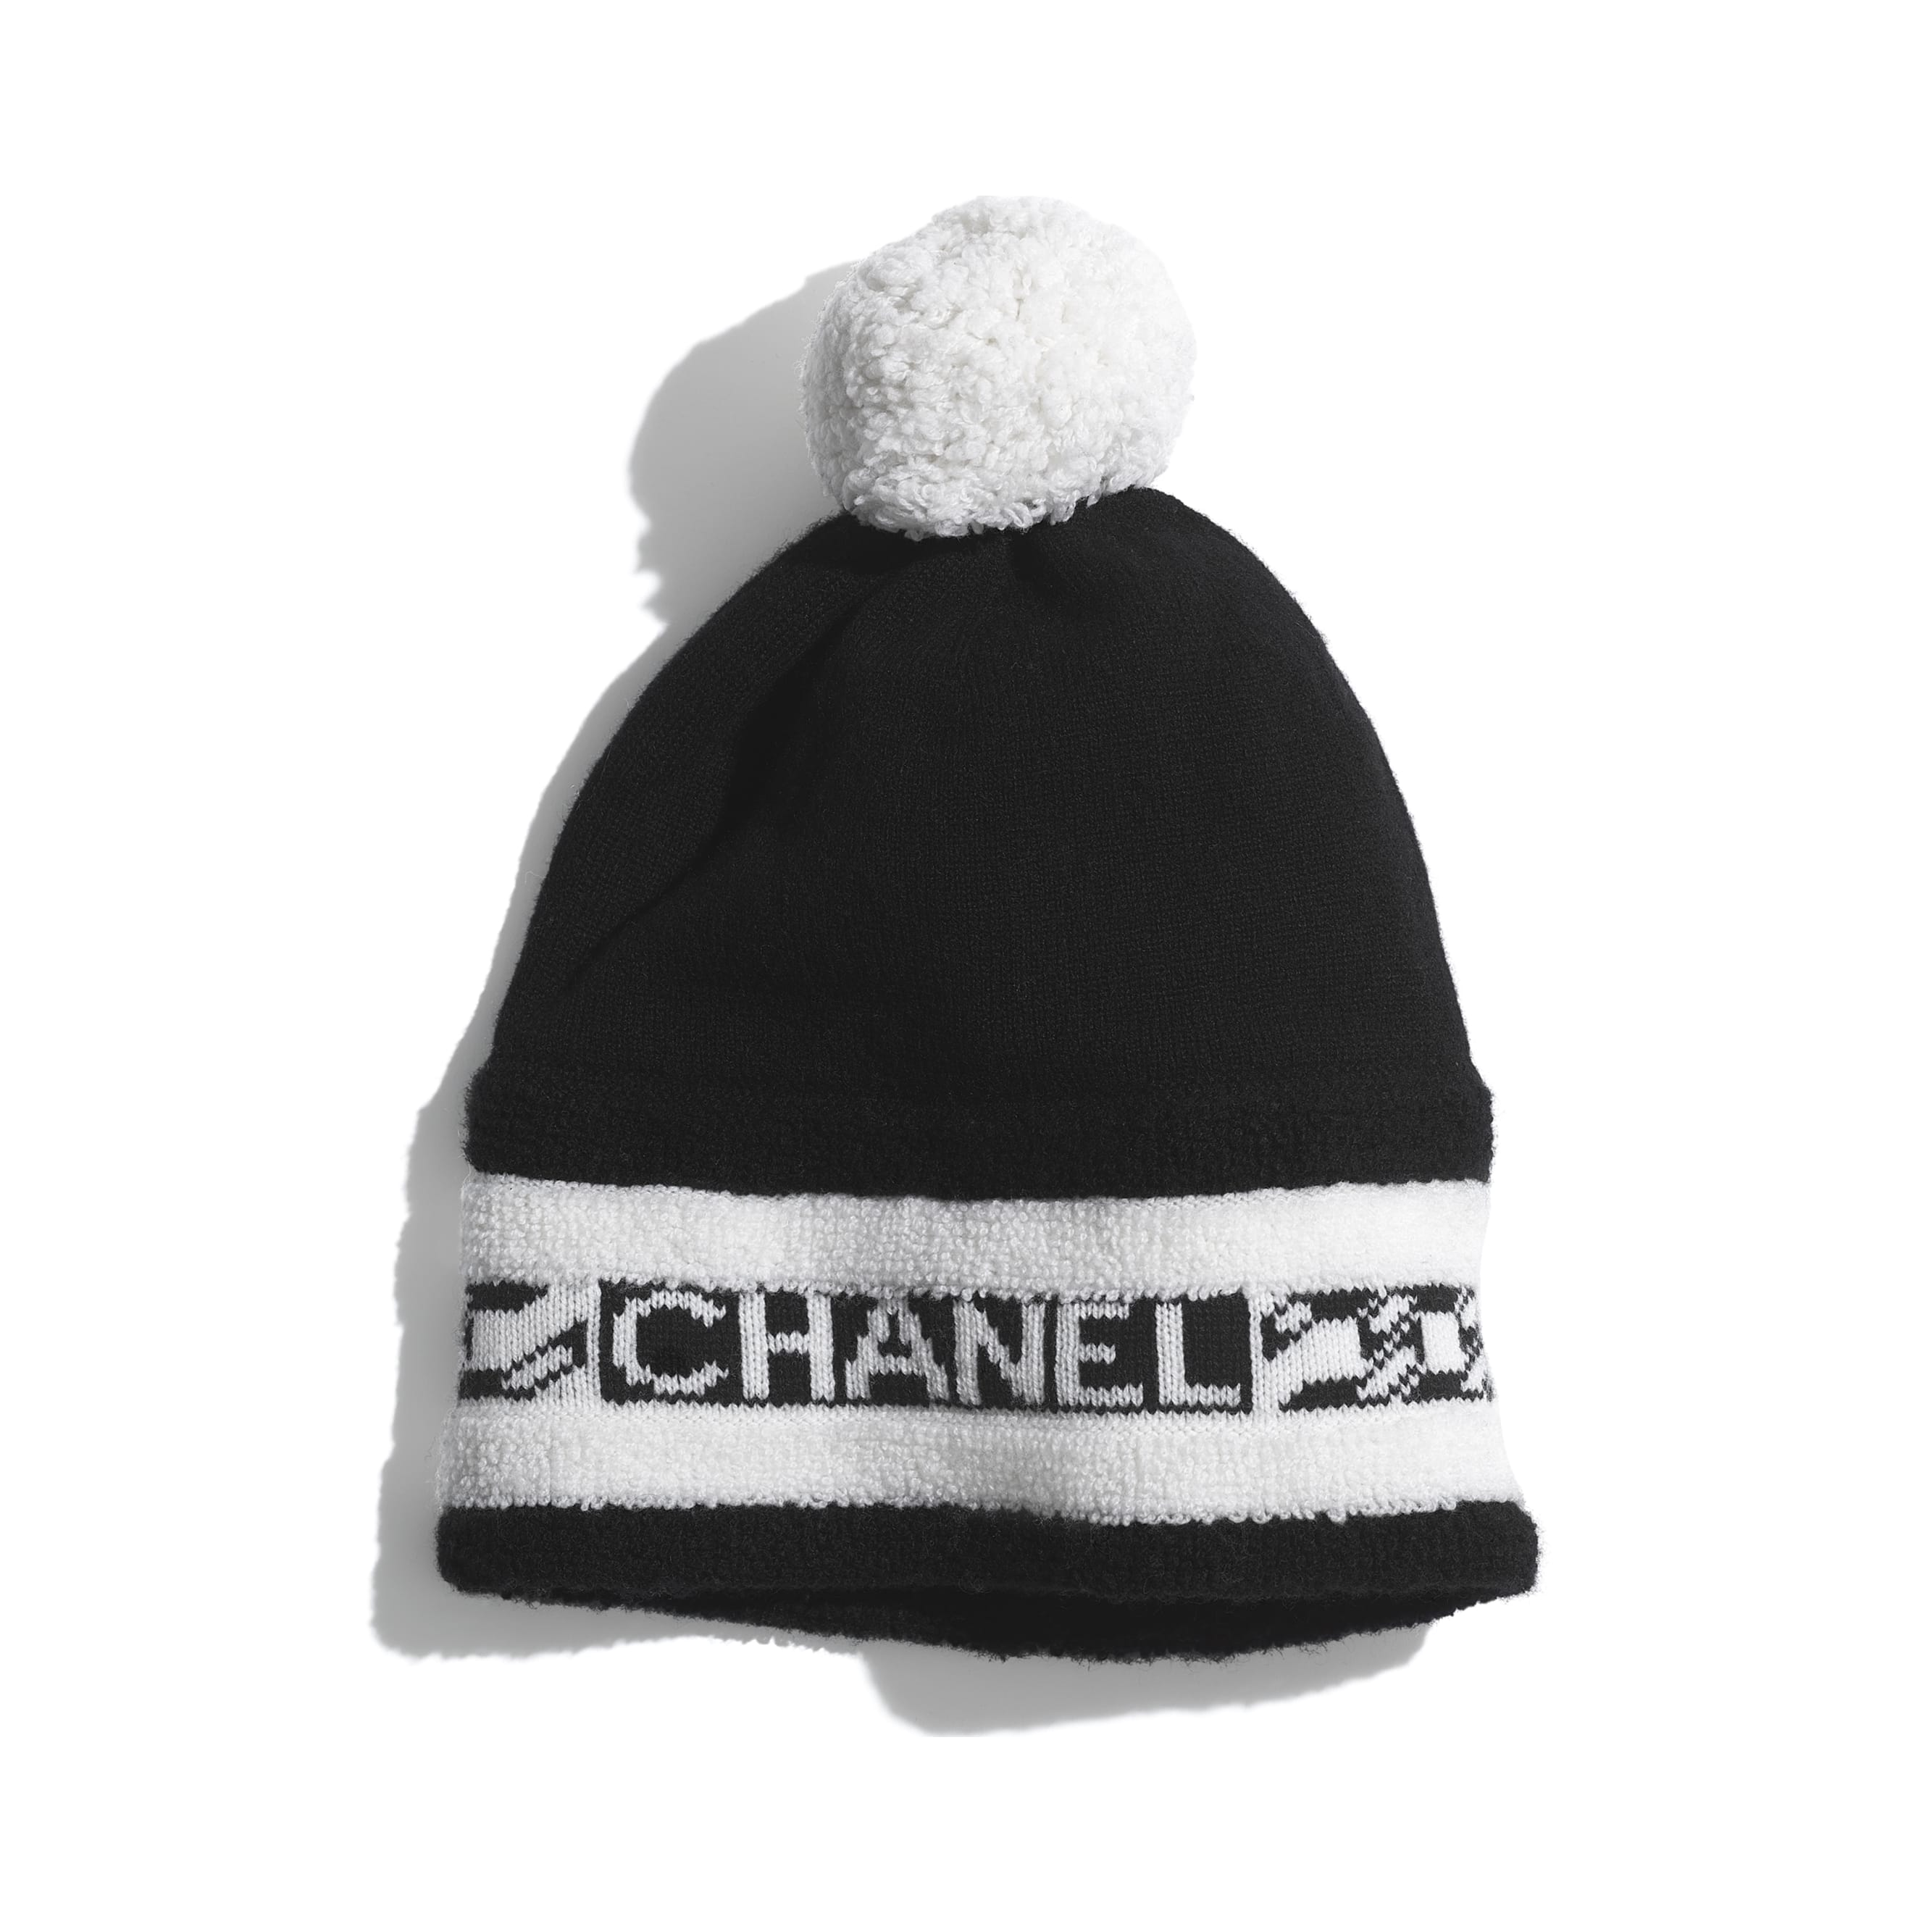 Beanie - Black & Ecru - Cashmere - CHANEL - Default view - see standard sized version